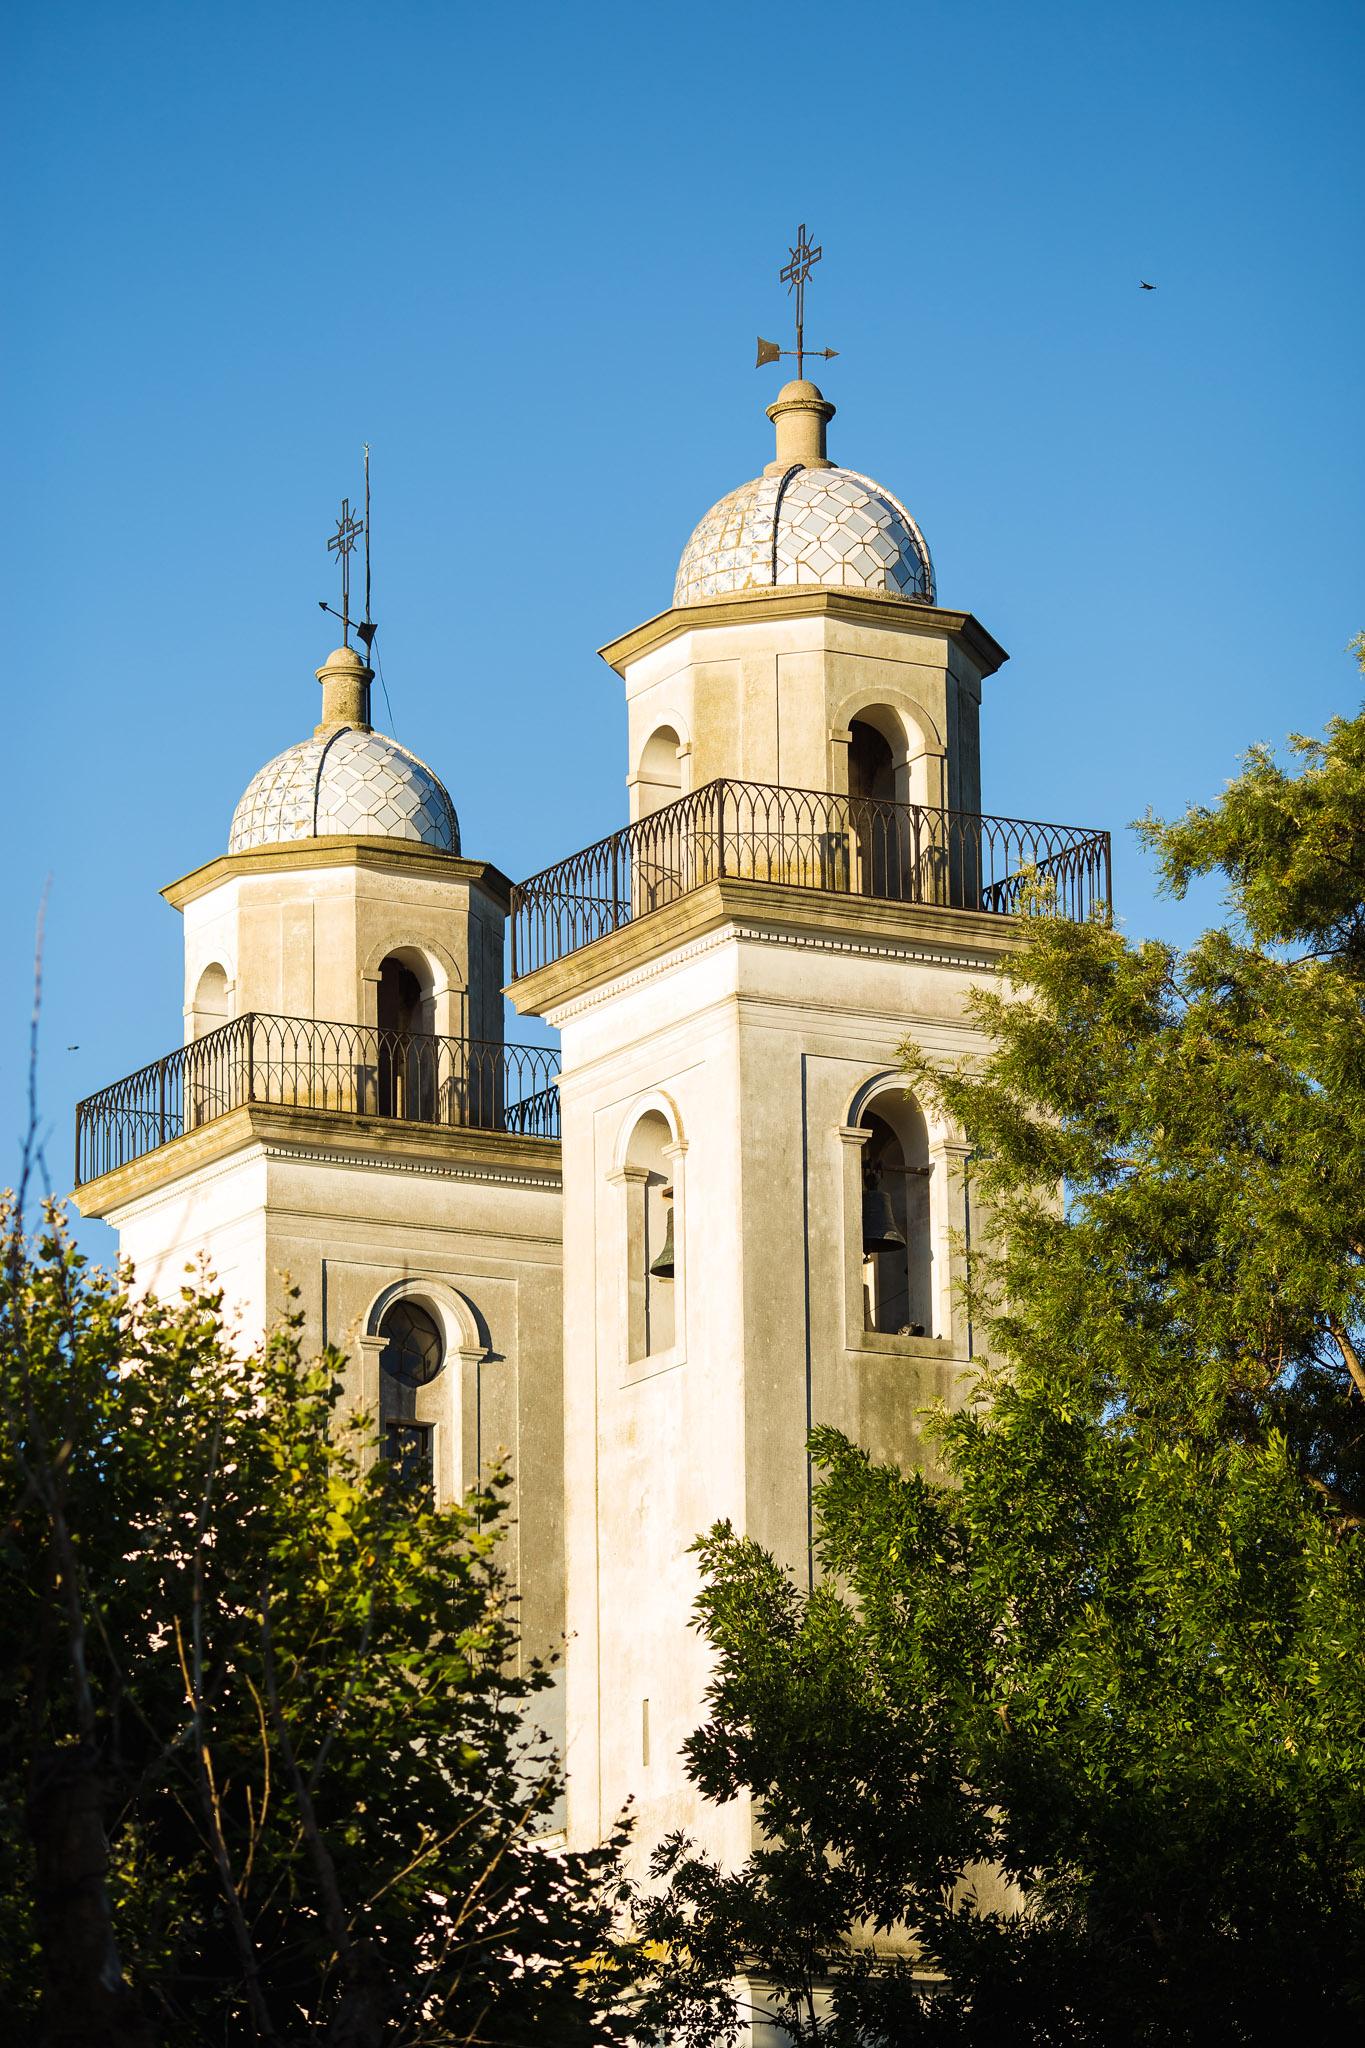 wedding-travellers-destination-photography-overlanding-south-america-uruguay-colonia-del-sacramento-church